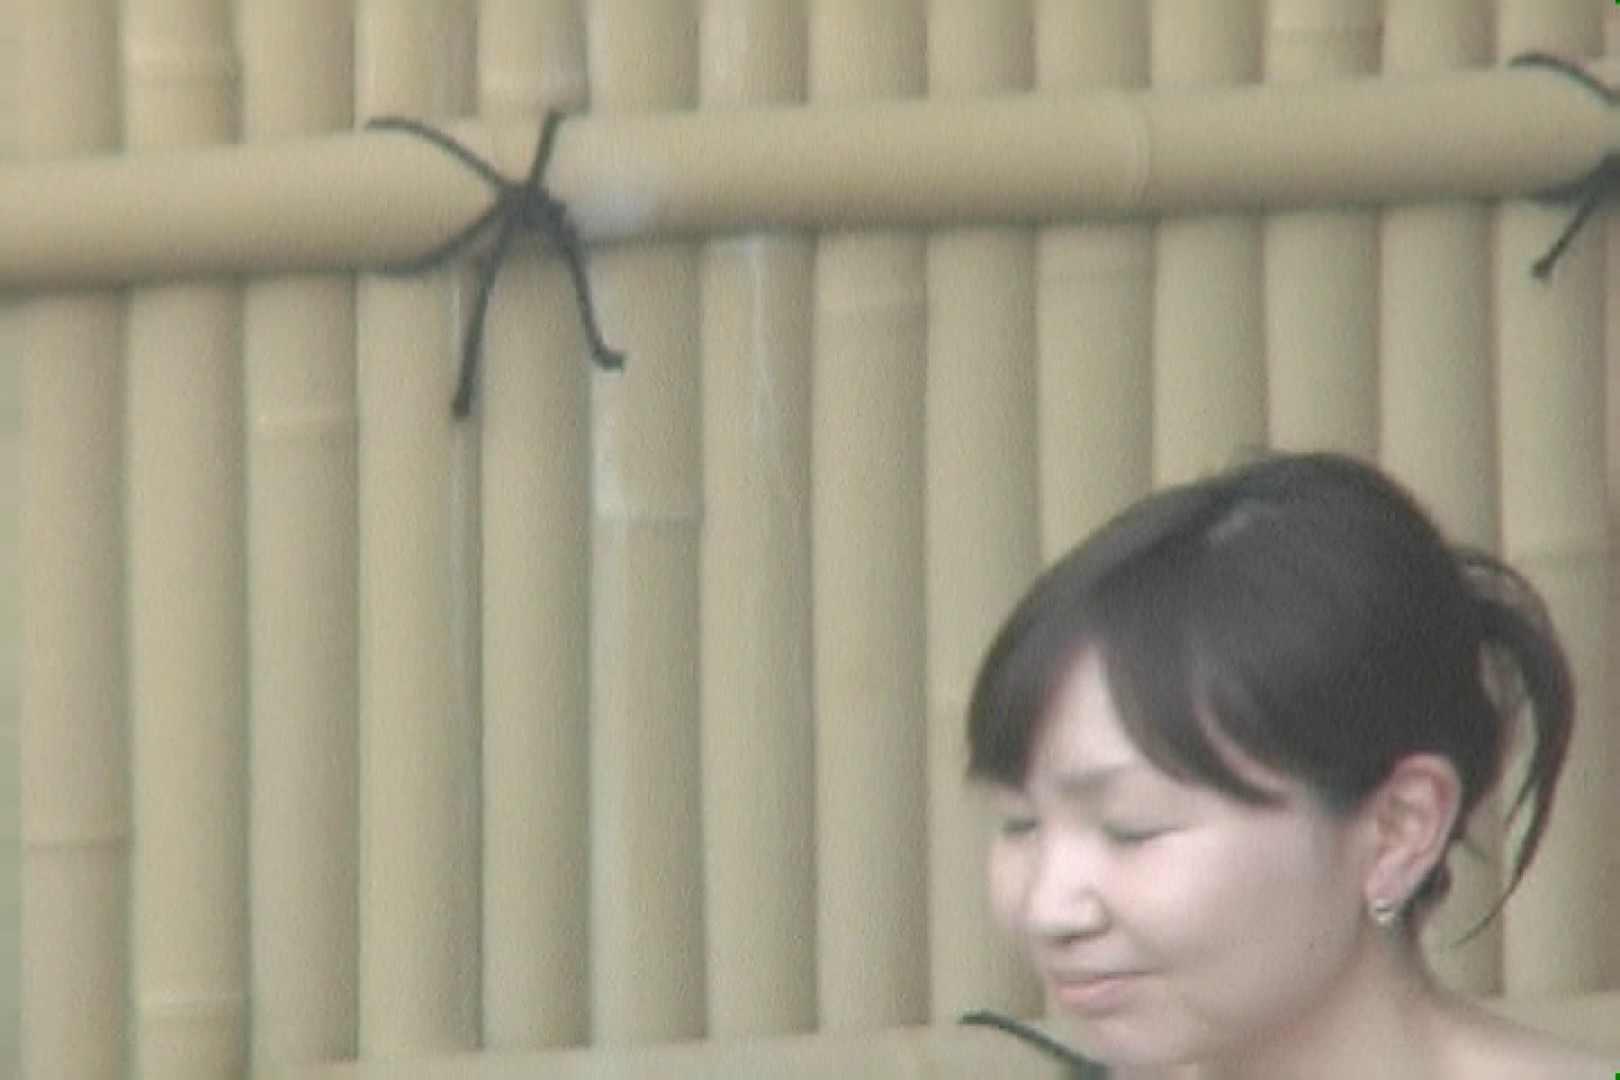 Aquaな露天風呂Vol.695 OLのエロ生活 オマンコ無修正動画無料 35連発 26